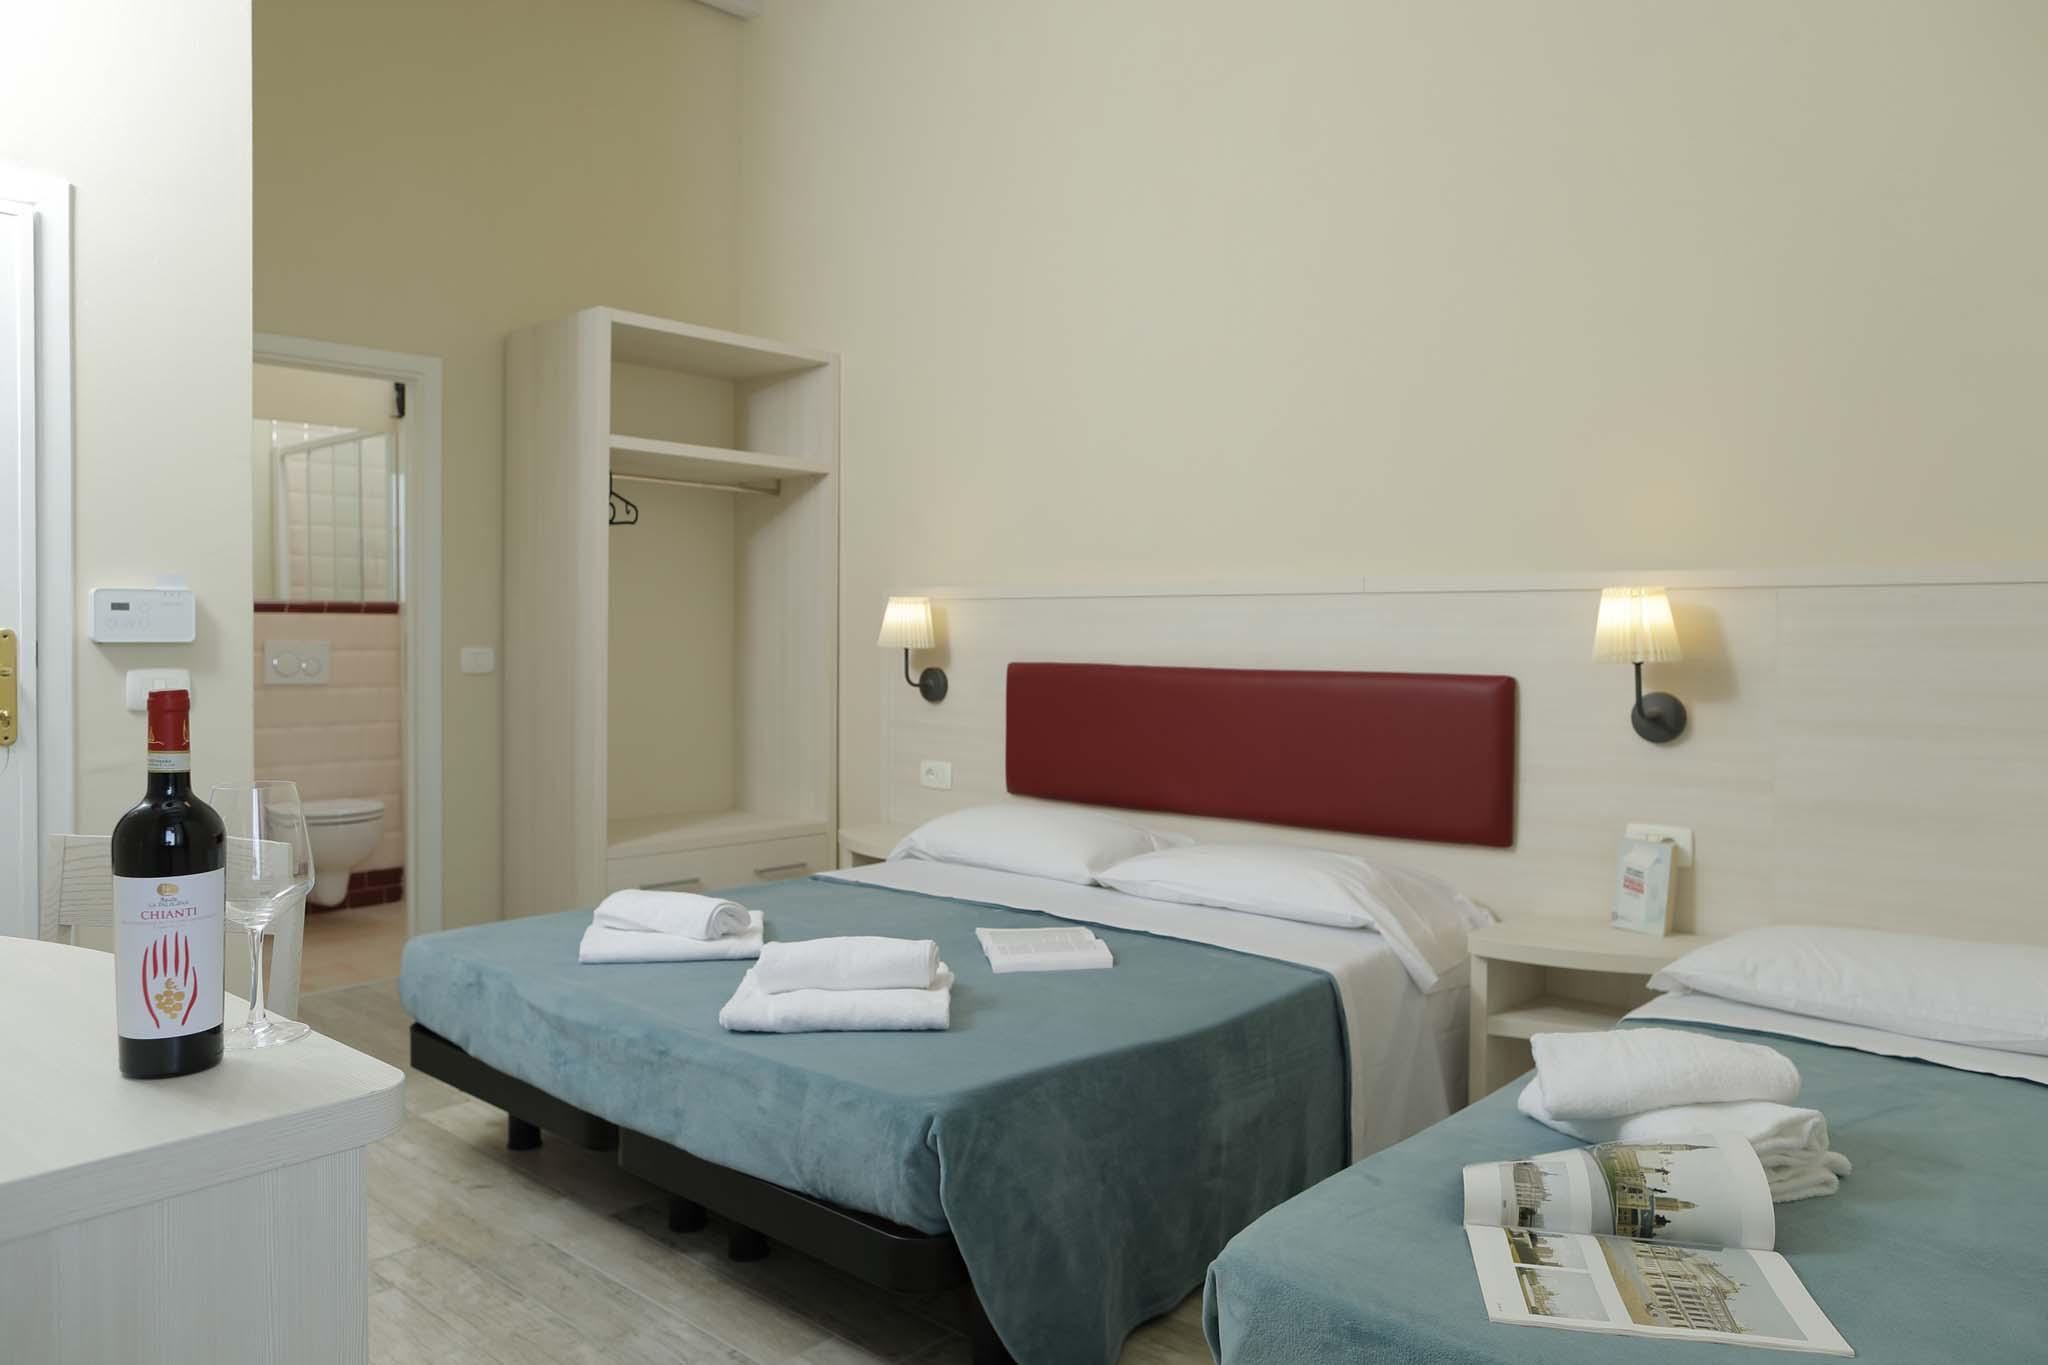 Camera tripla Hotel a San Vincenzo Toscana